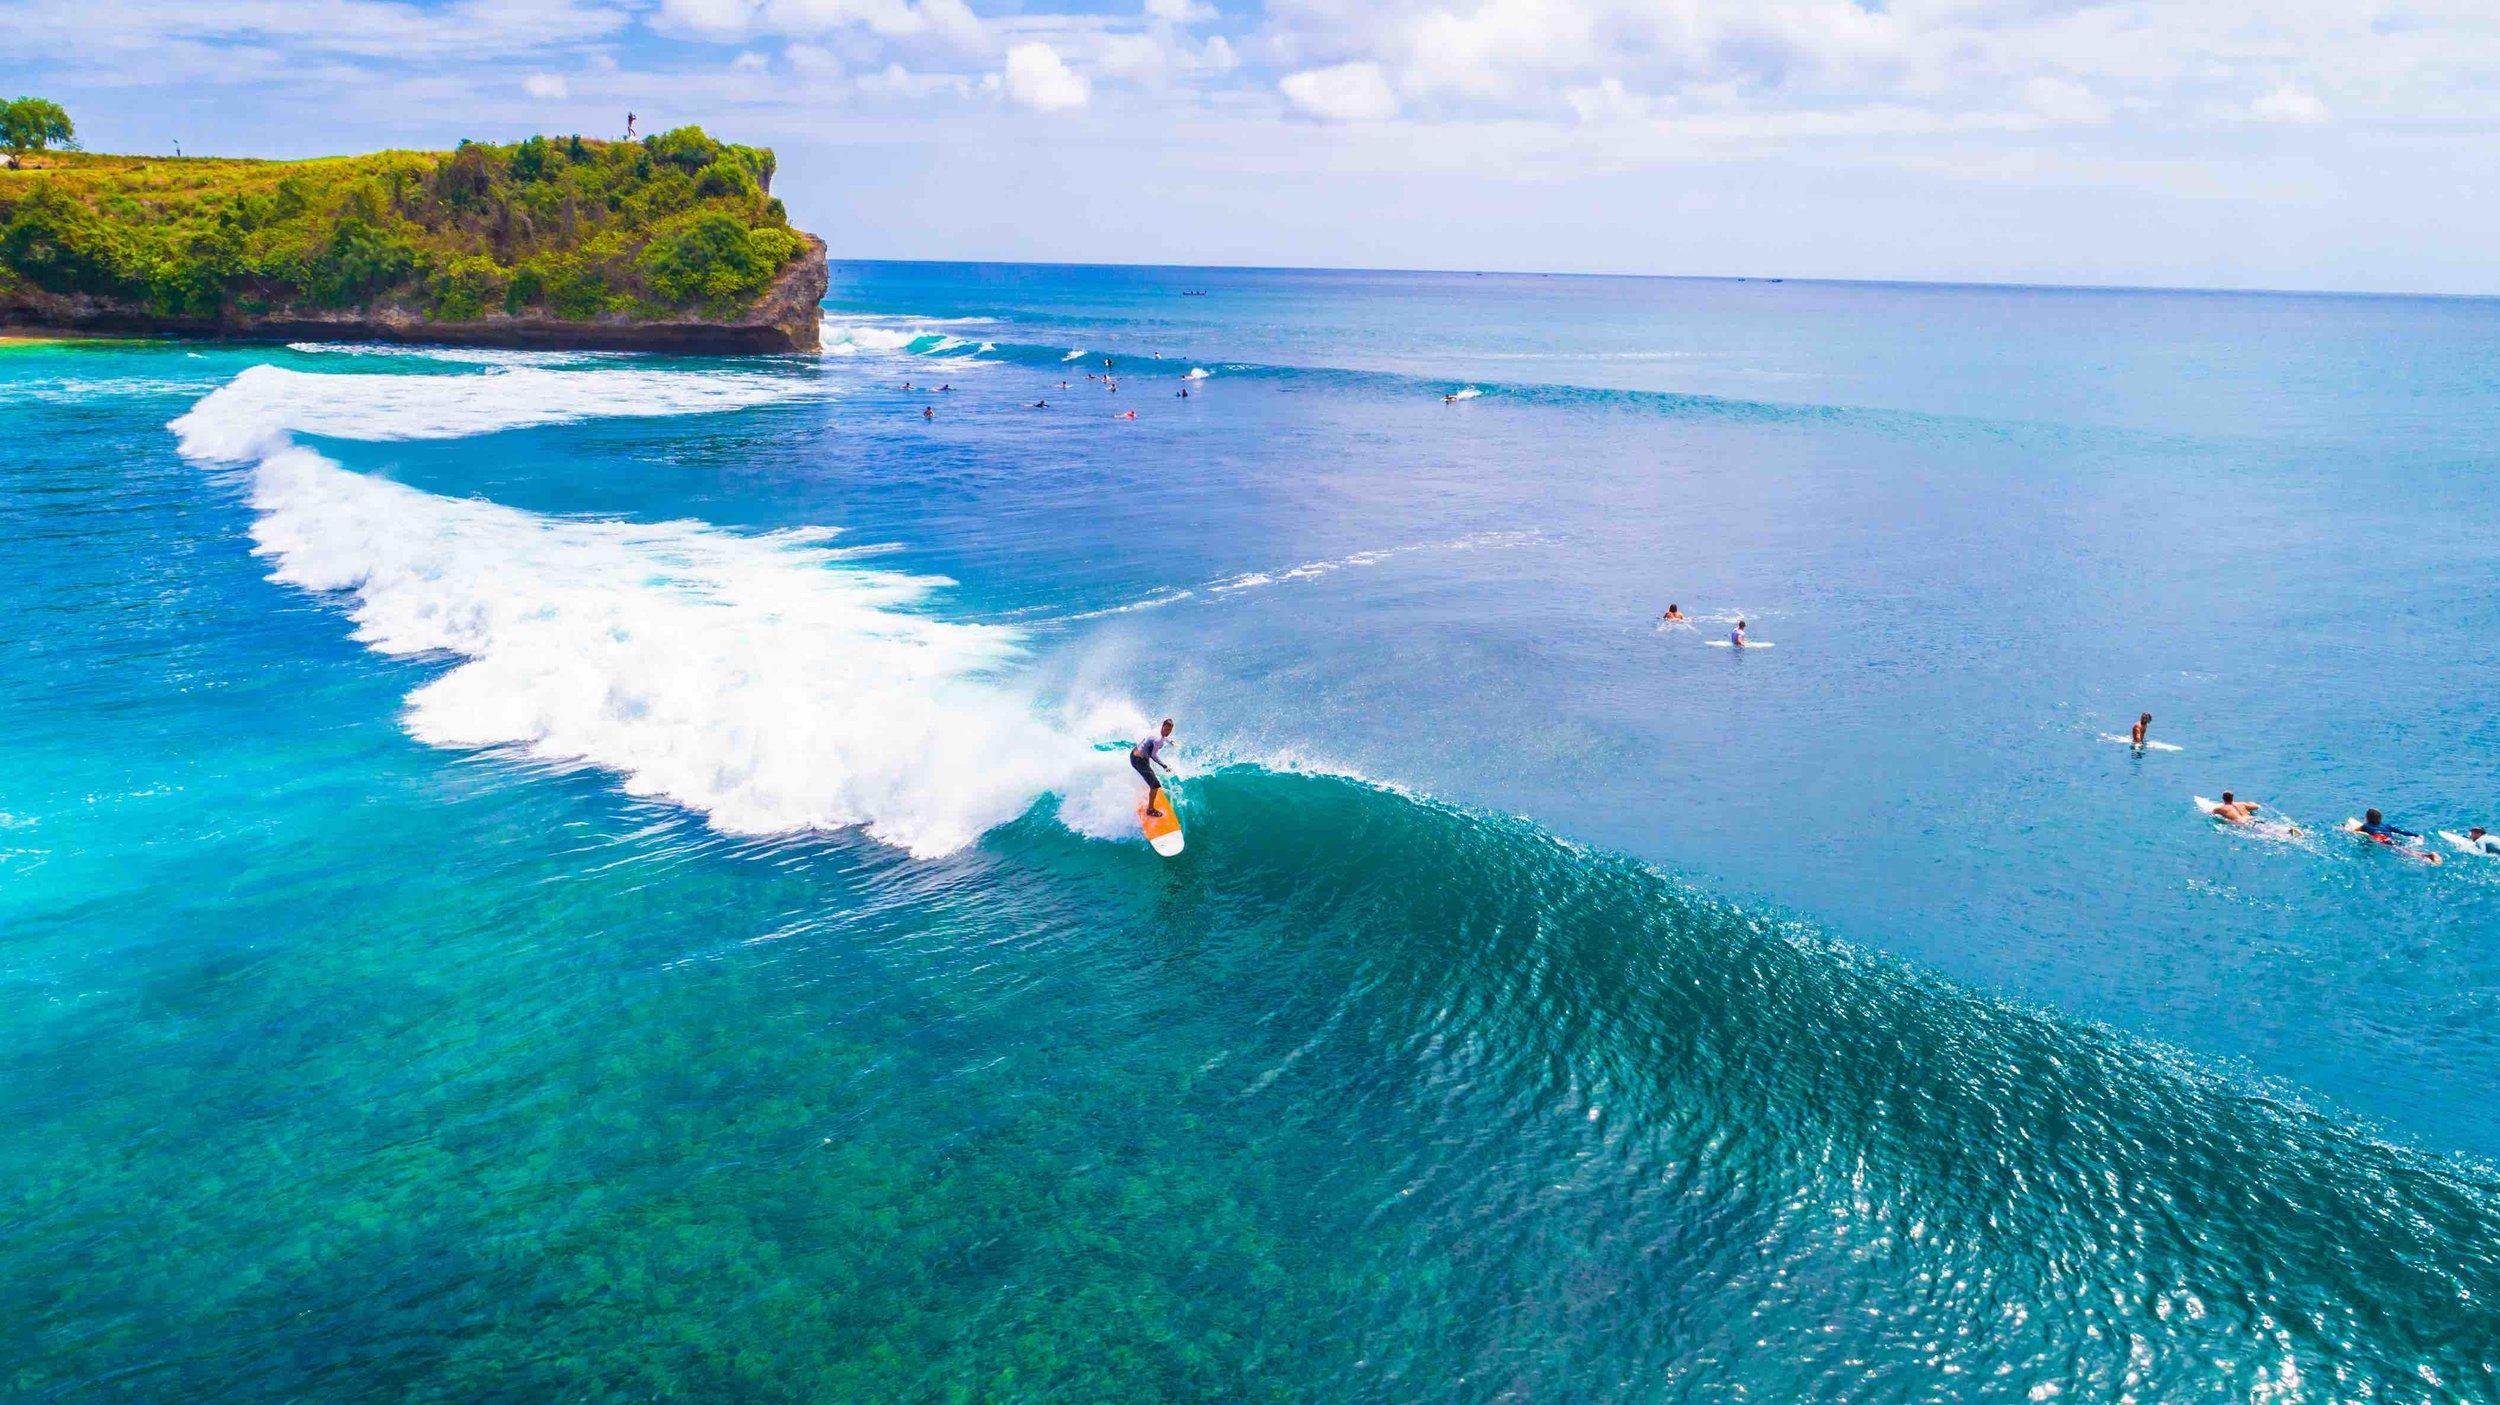 Surfing the breaks of Balangan Beach, Bali